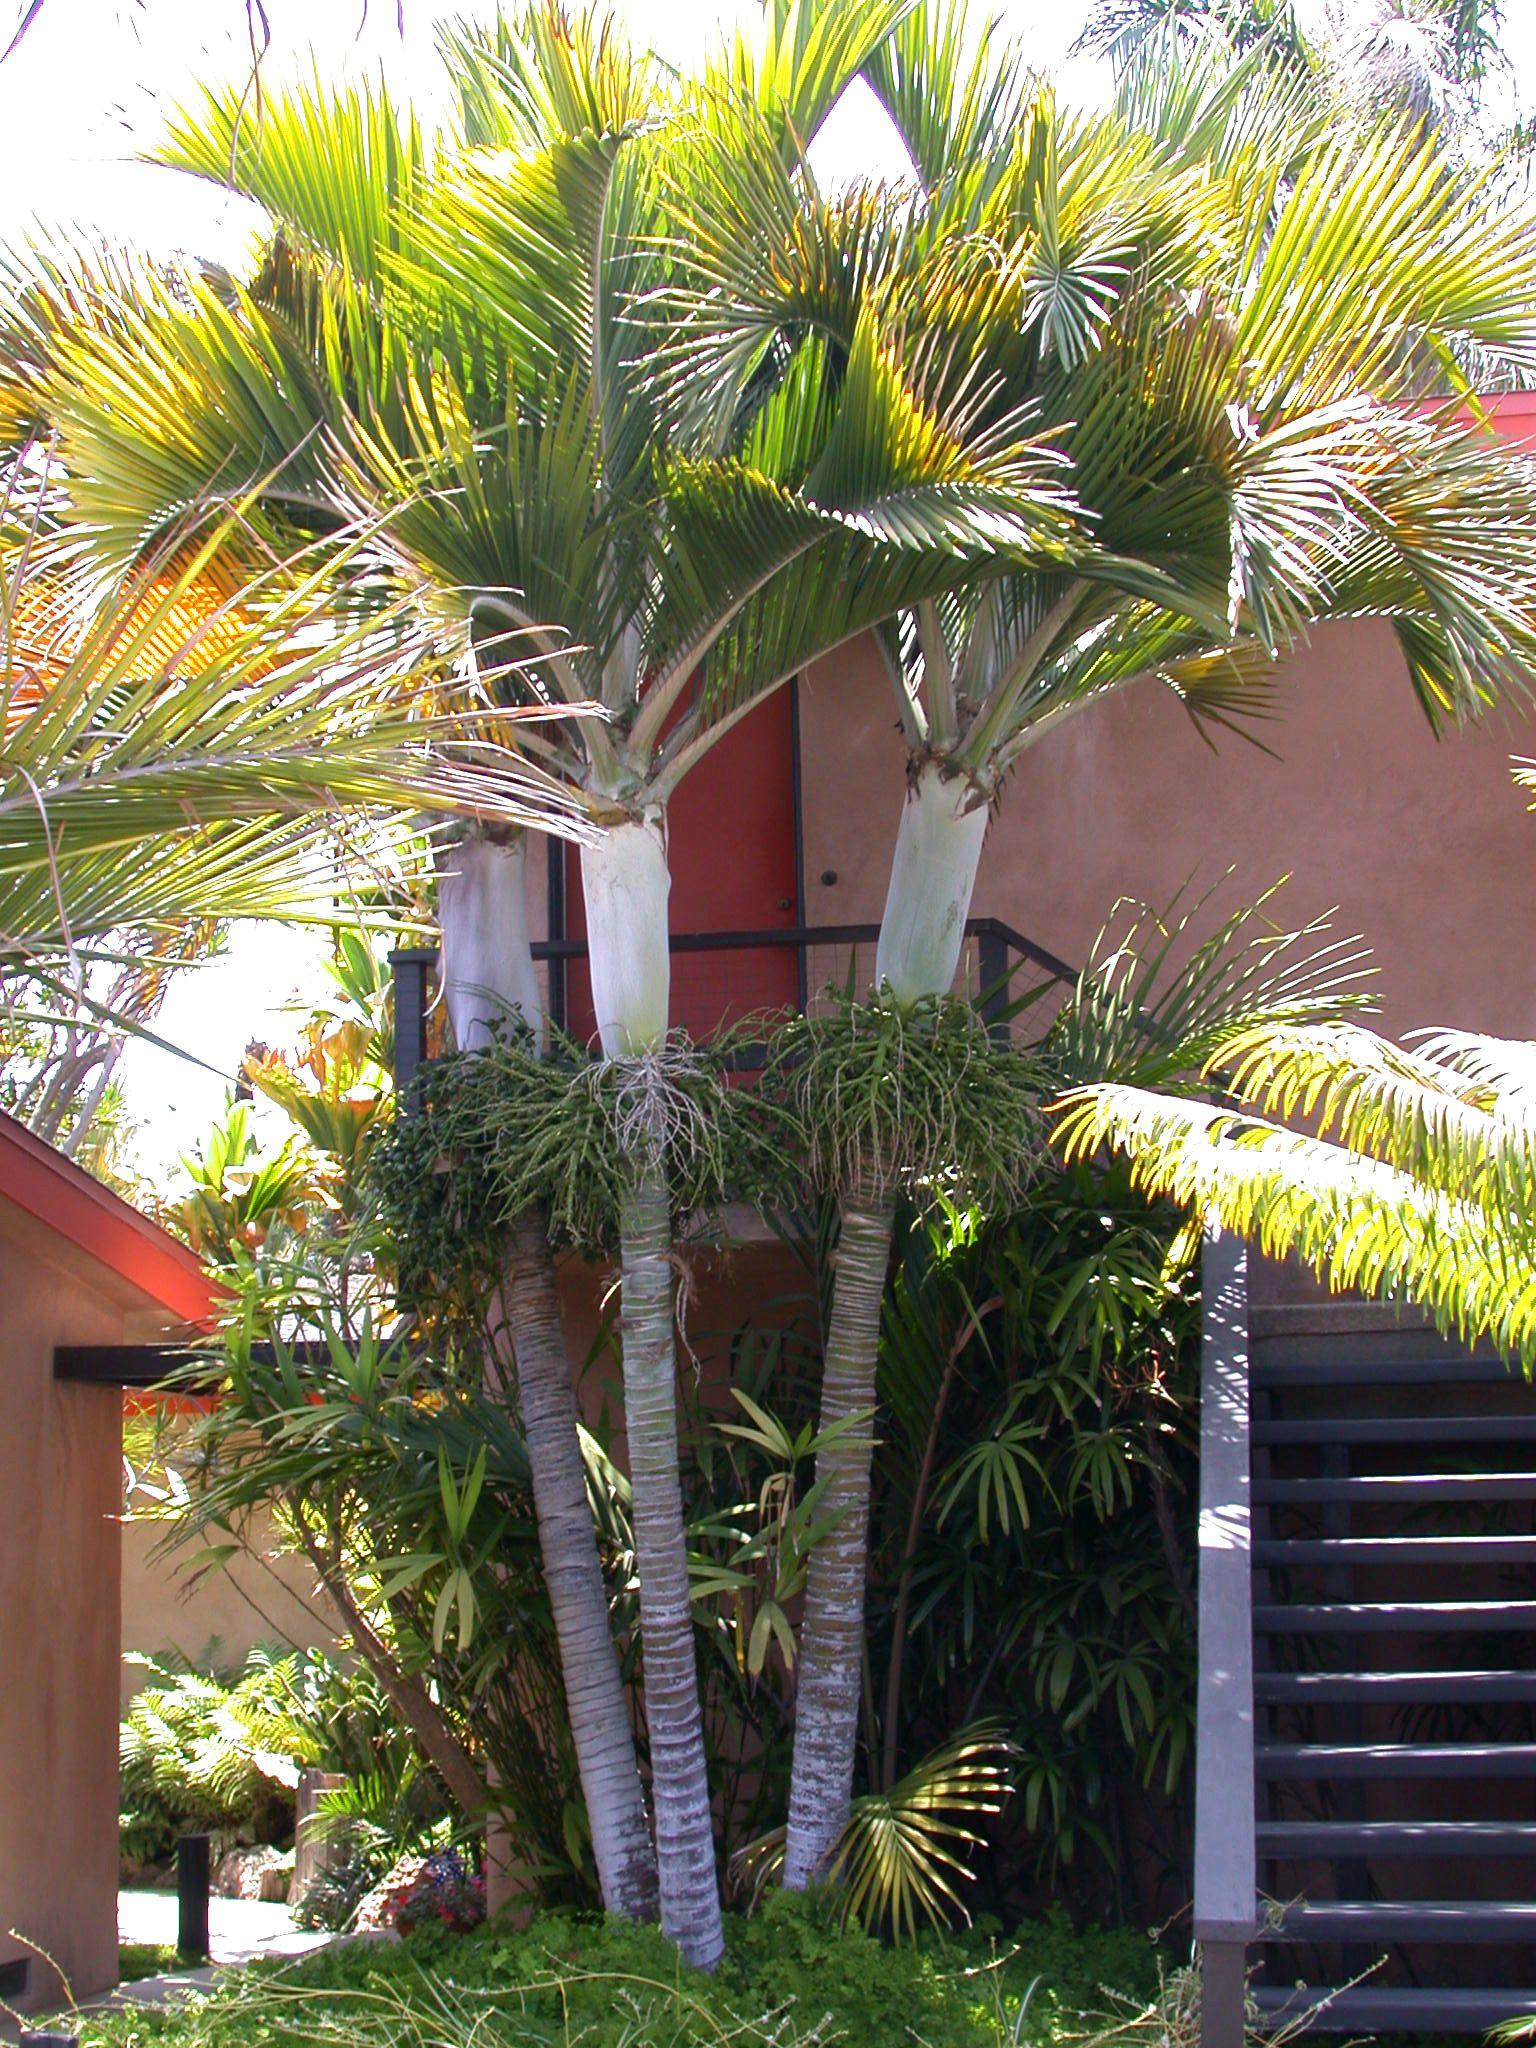 Hedyscepe Canterburyana Palms In